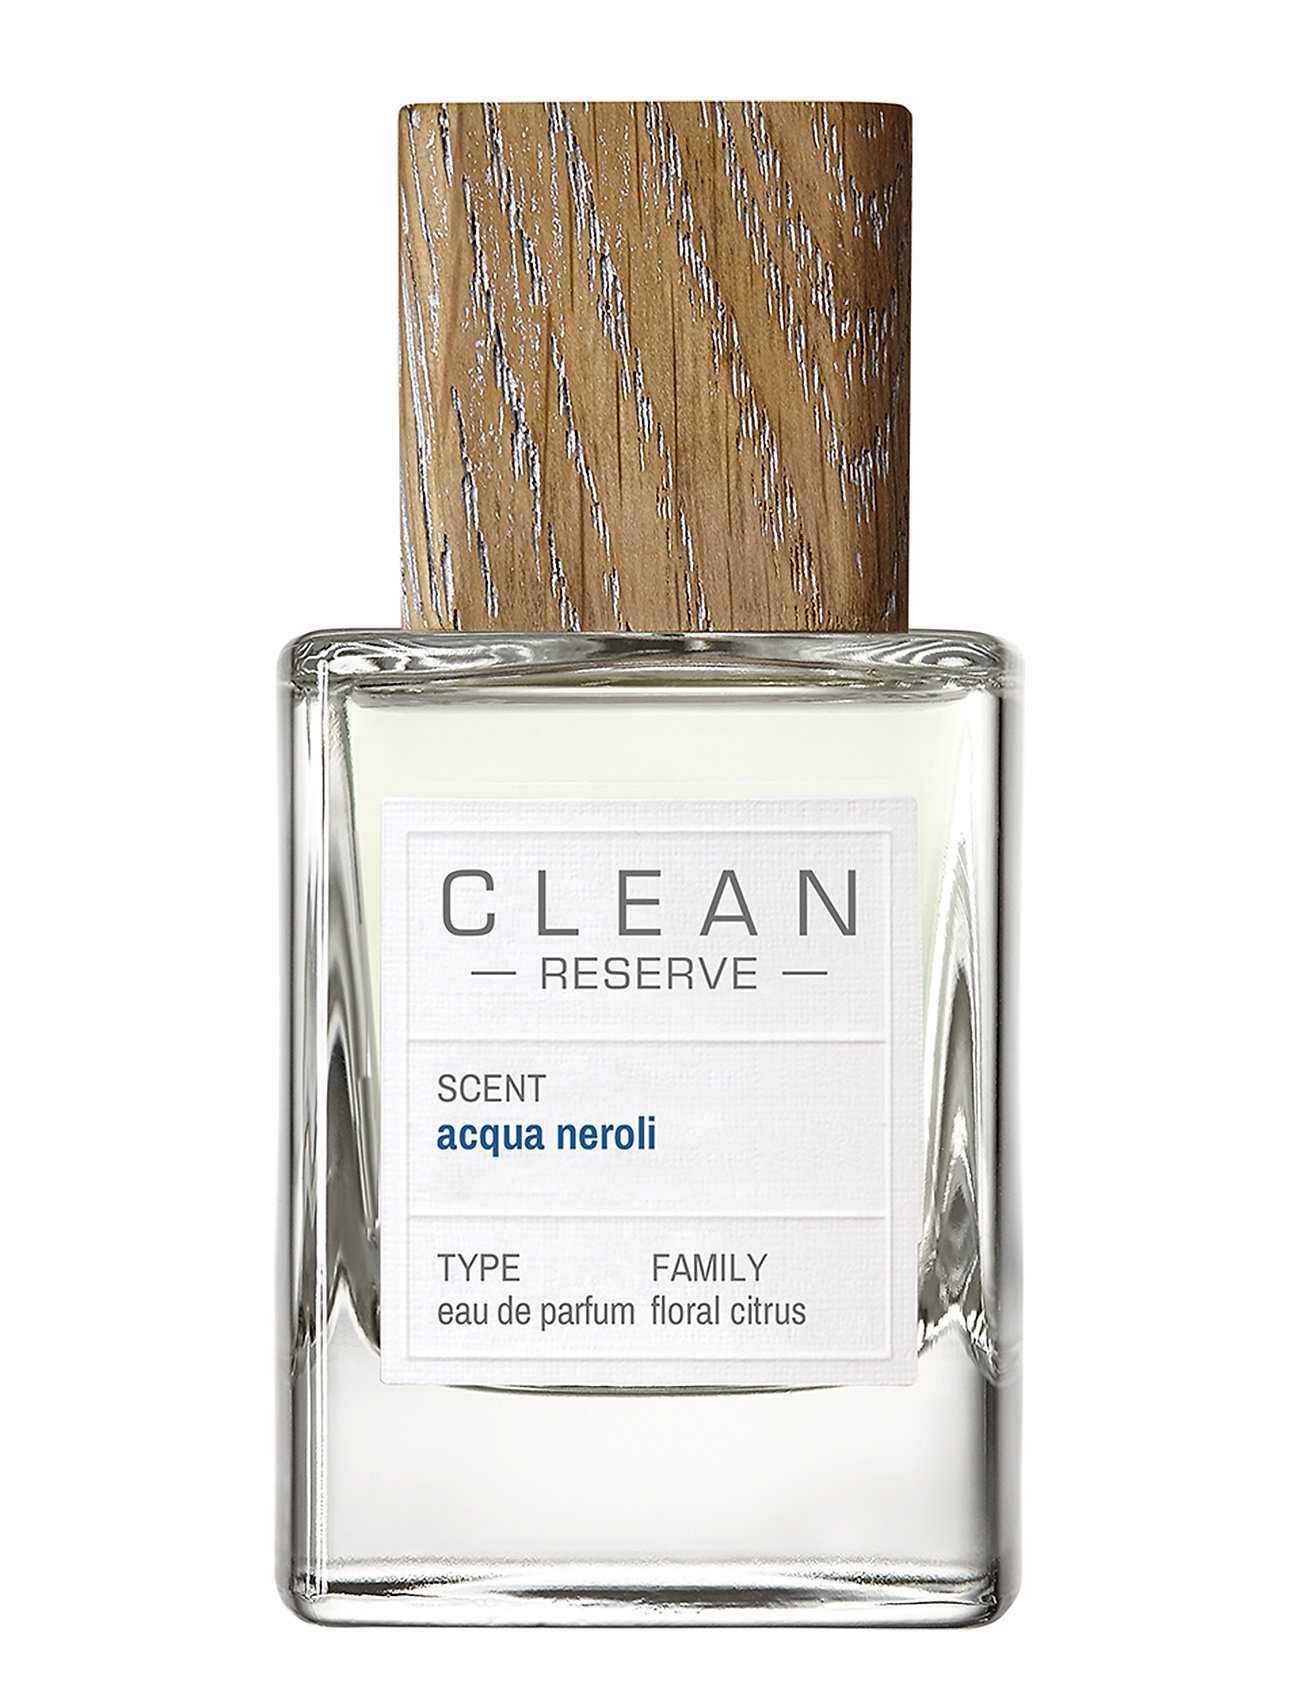 CLEAN RESERVE Acqua Neroli Eau de Parfum - CLEAR